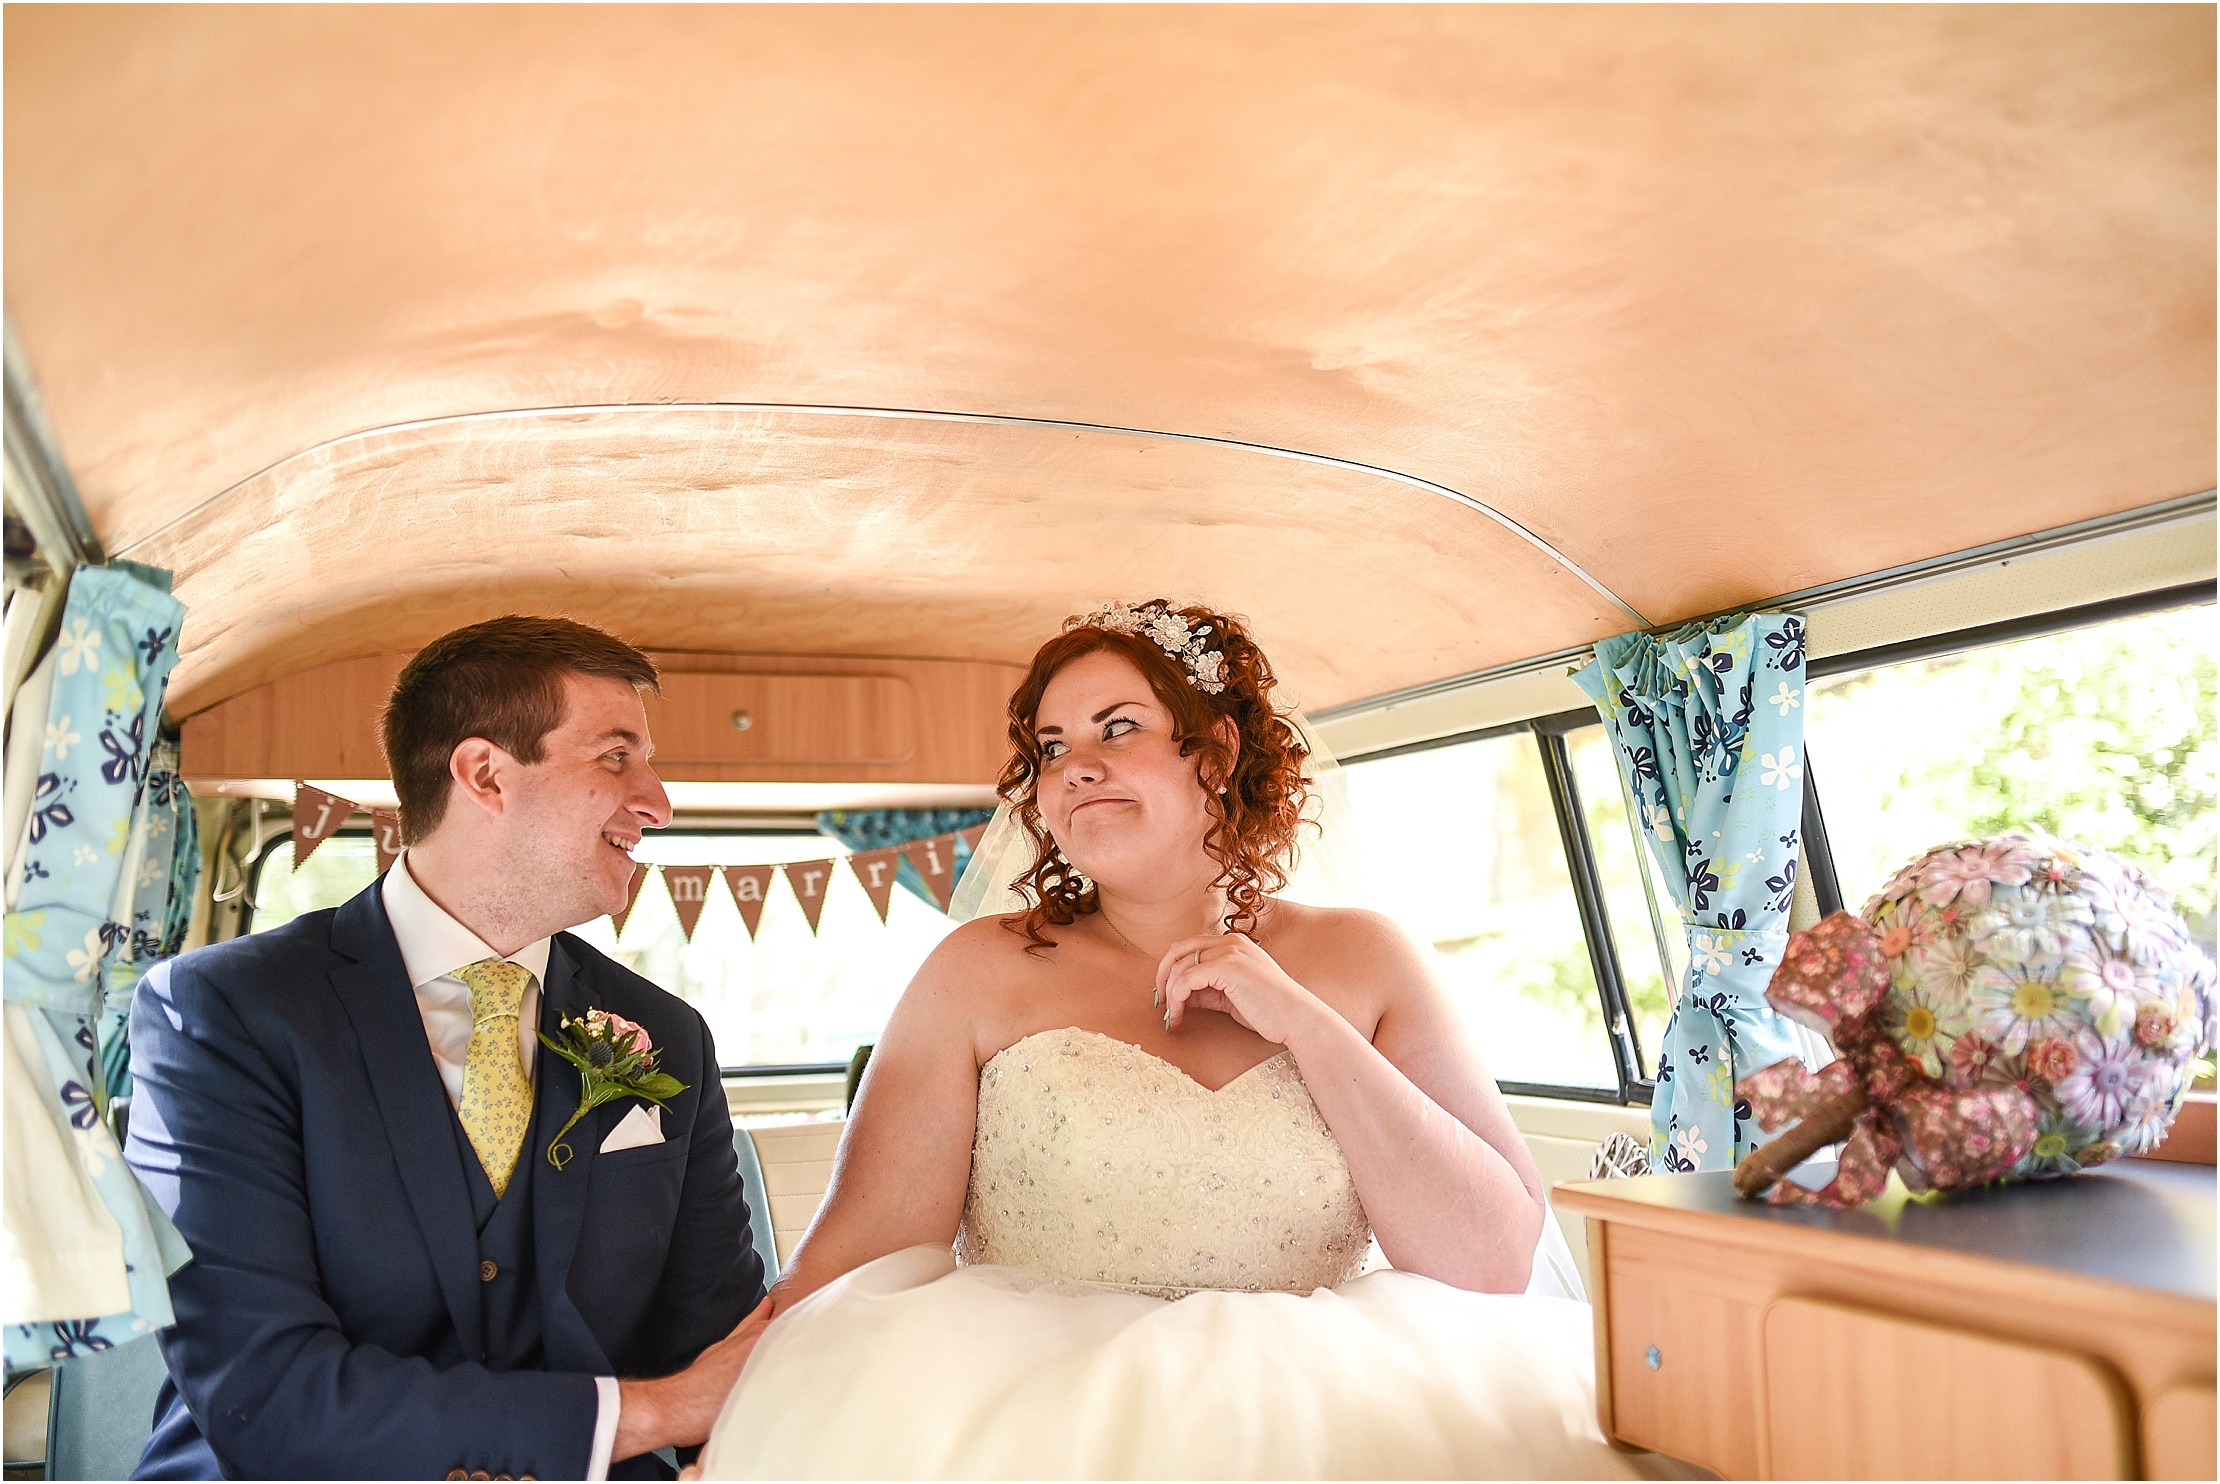 shireburn-arms-wedding- 074.jpg